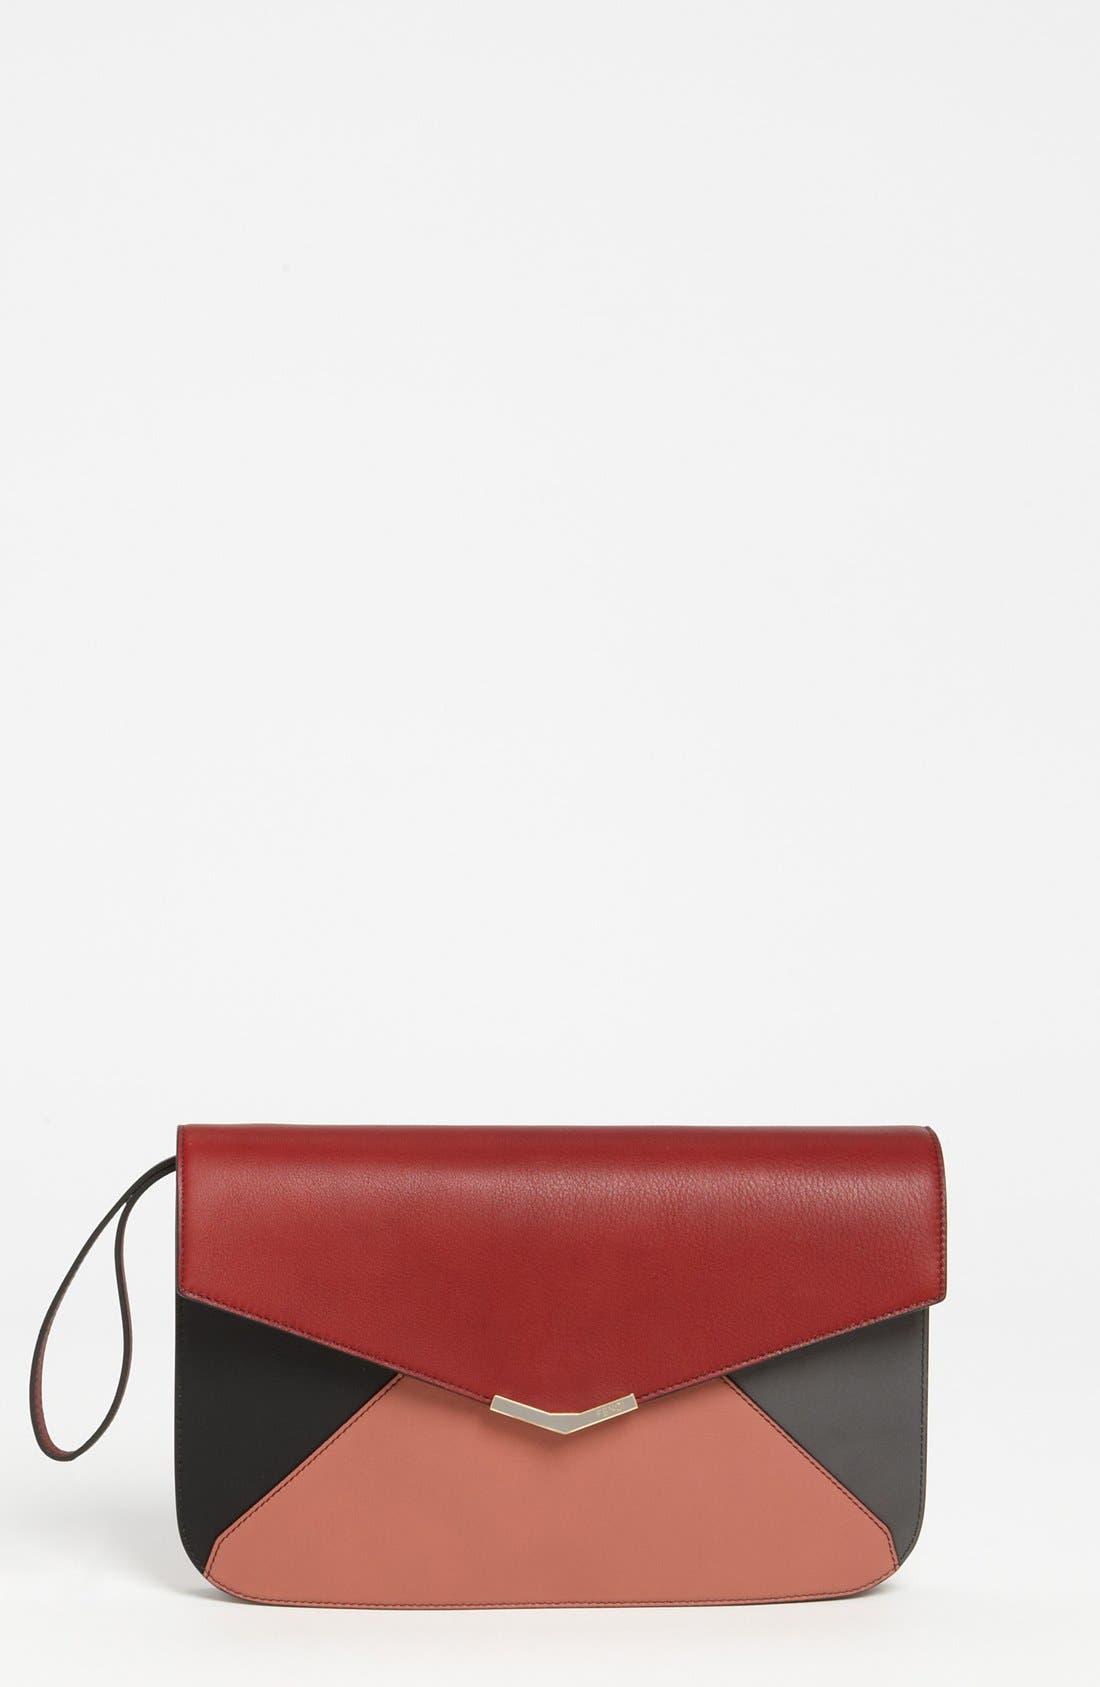 Main Image - Fendi '2Jours Colorblock' Leather Clutch